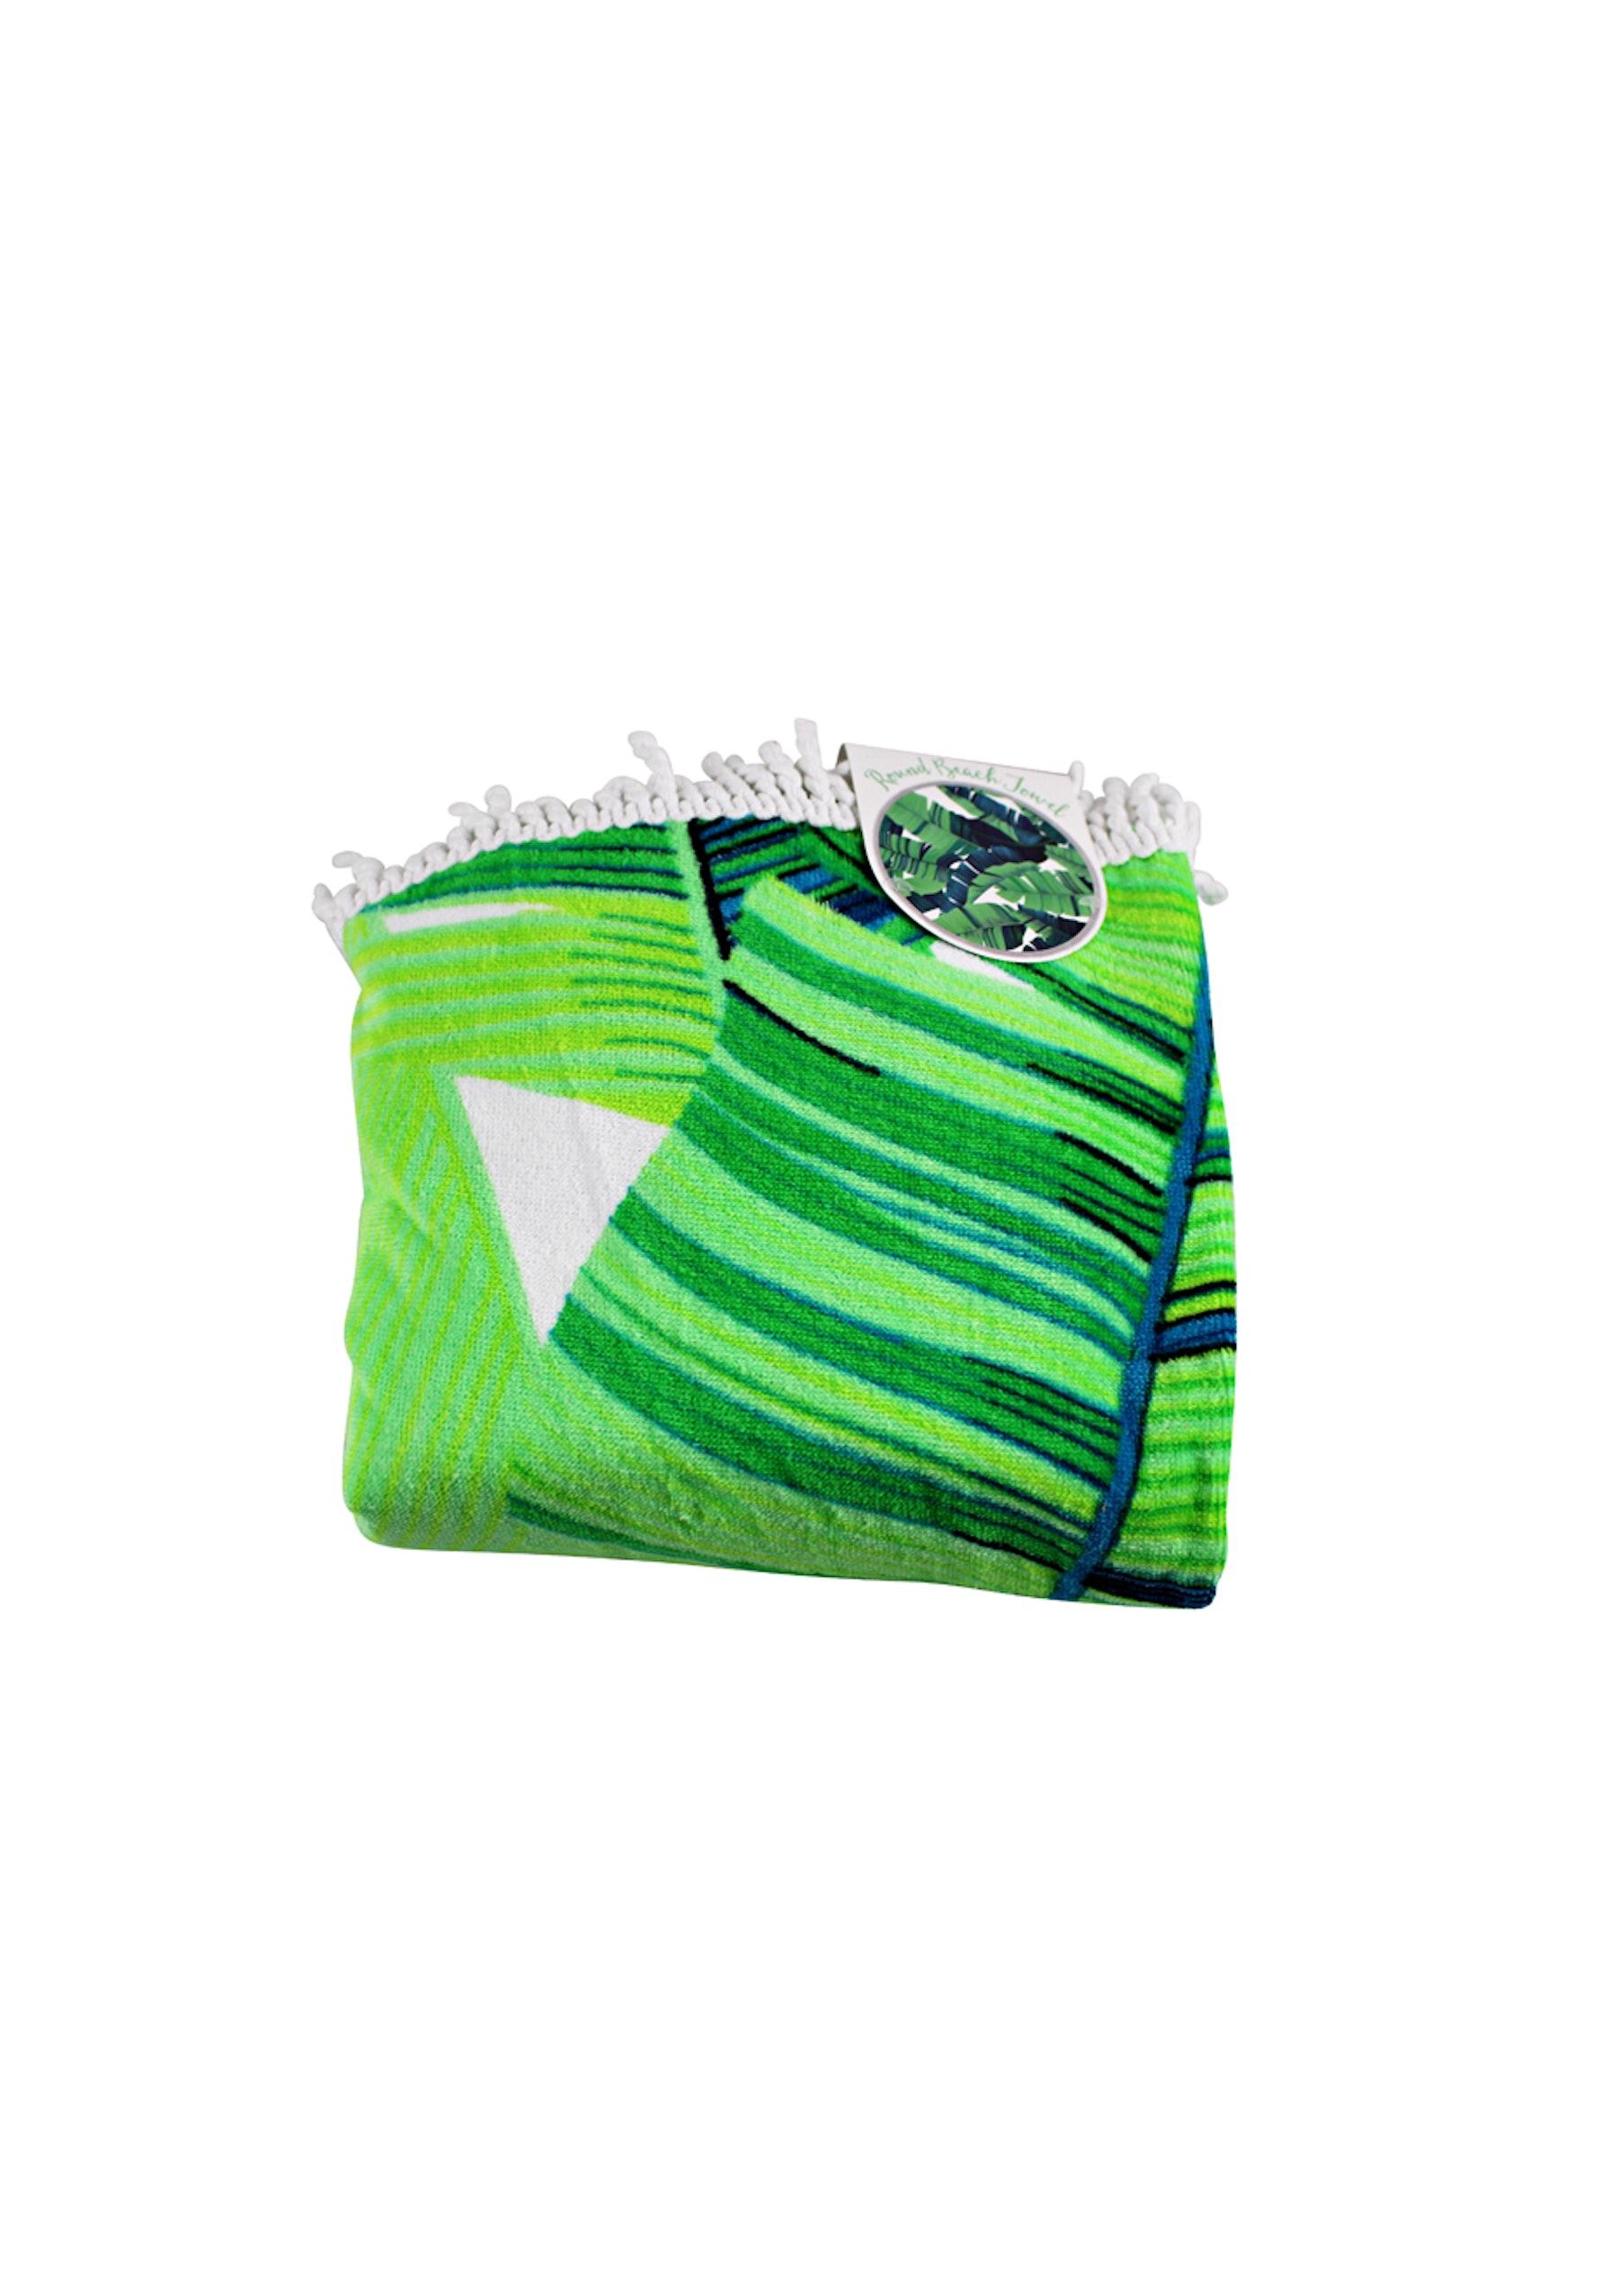 100 Cotton Round Beach Towel Palm Cove 140x140cm 350 Gsm